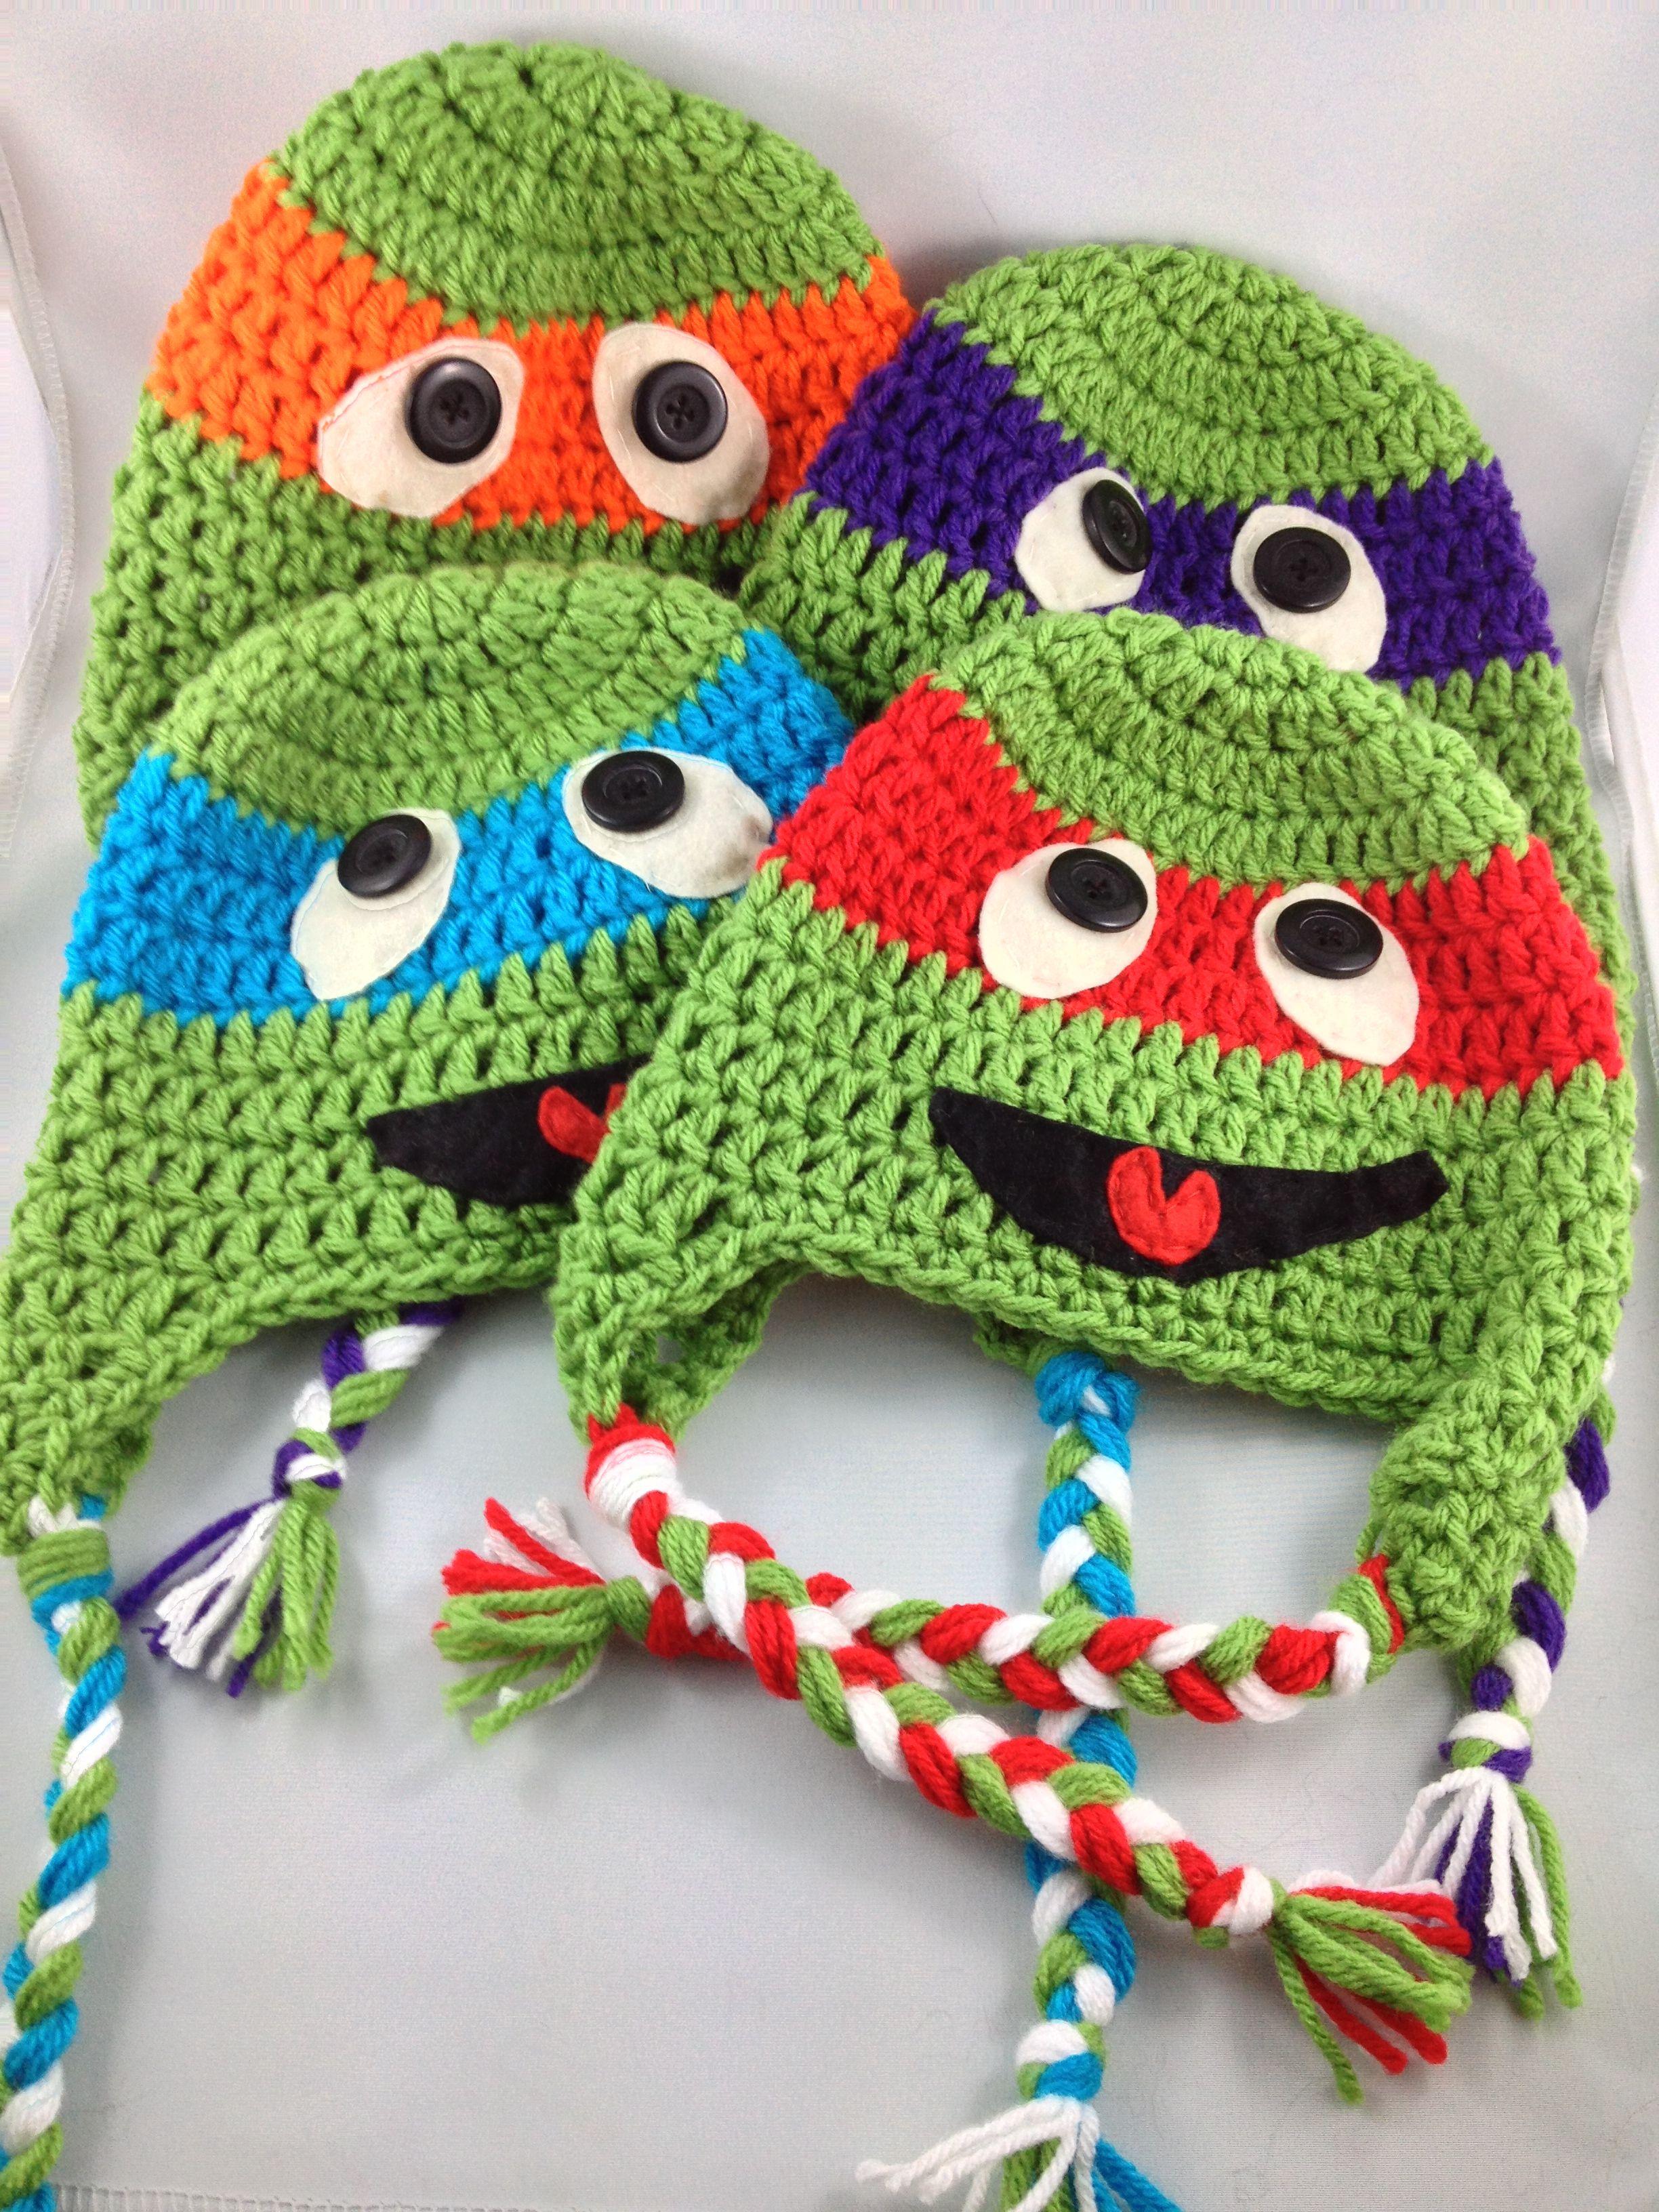 Crochet Ninja Turtles Beanie Hat Kids Patrones De Gran Chillo